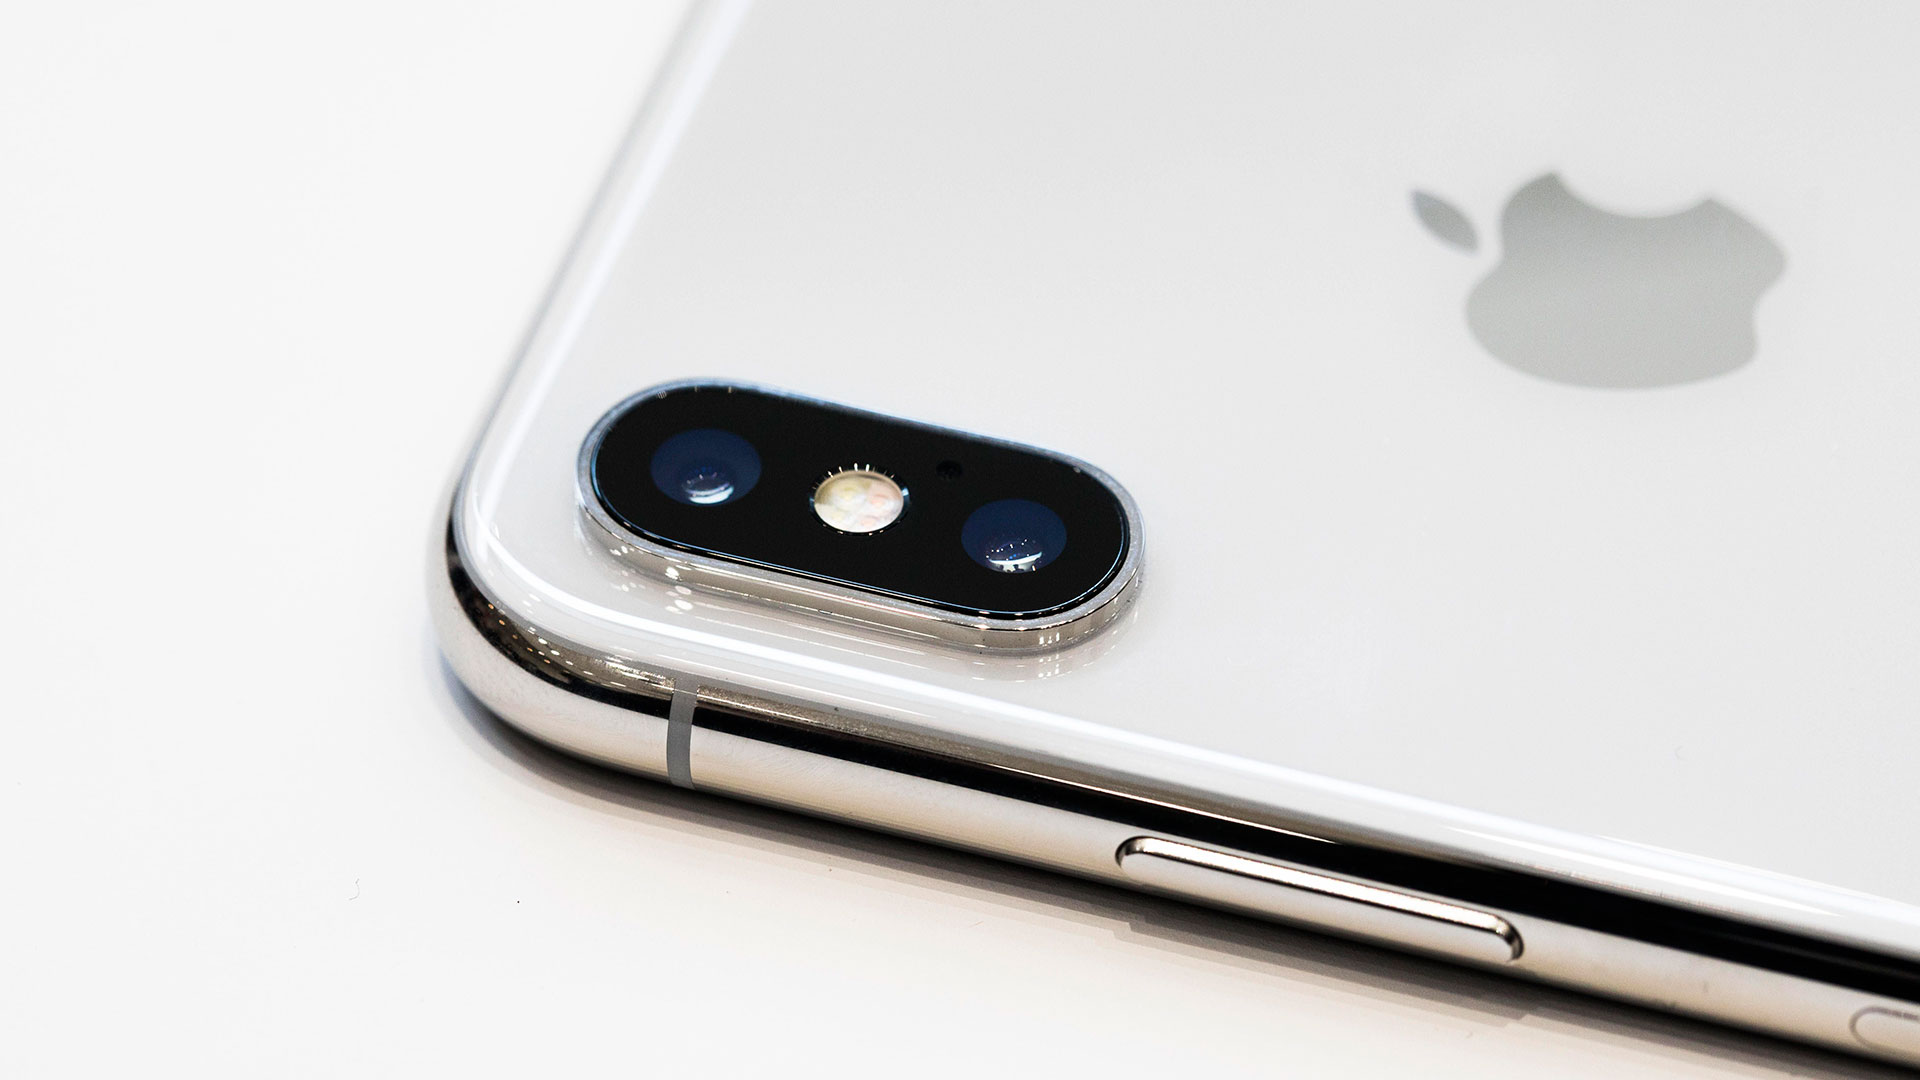 Decada iphone hero asset